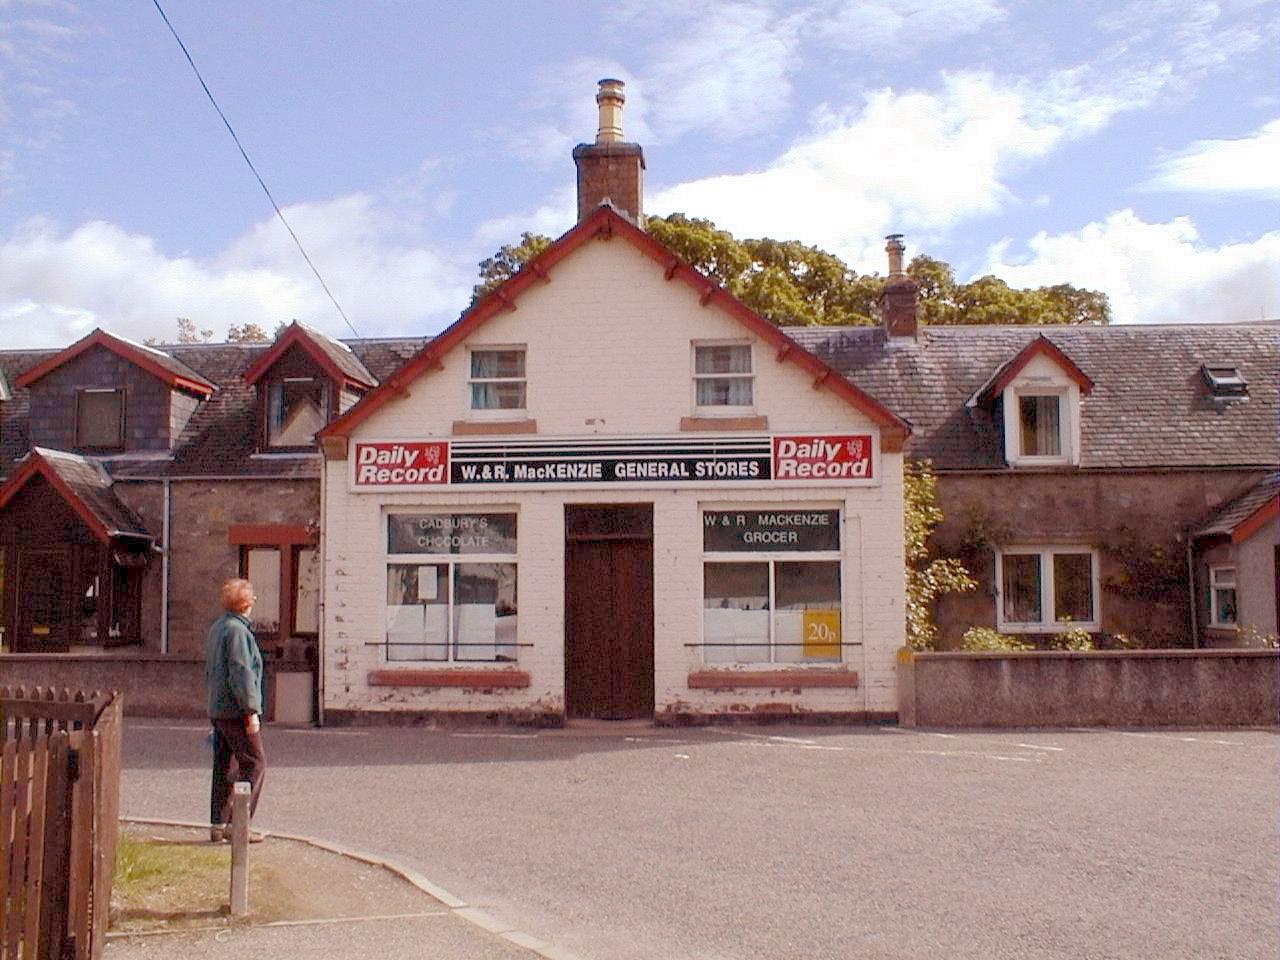 Garve shop